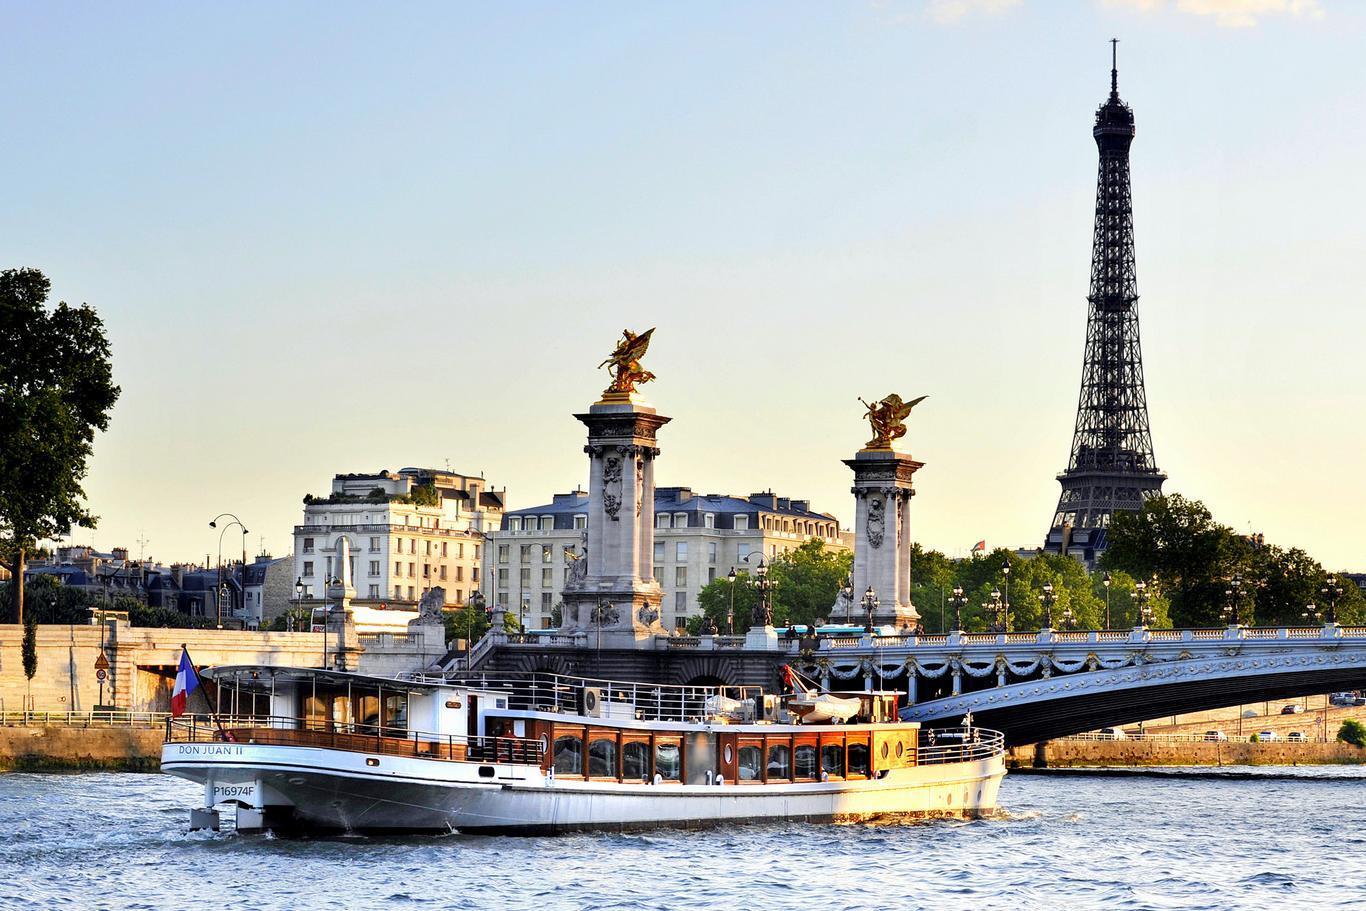 20140519105851-don-juan-seine-river-dinner-cruise